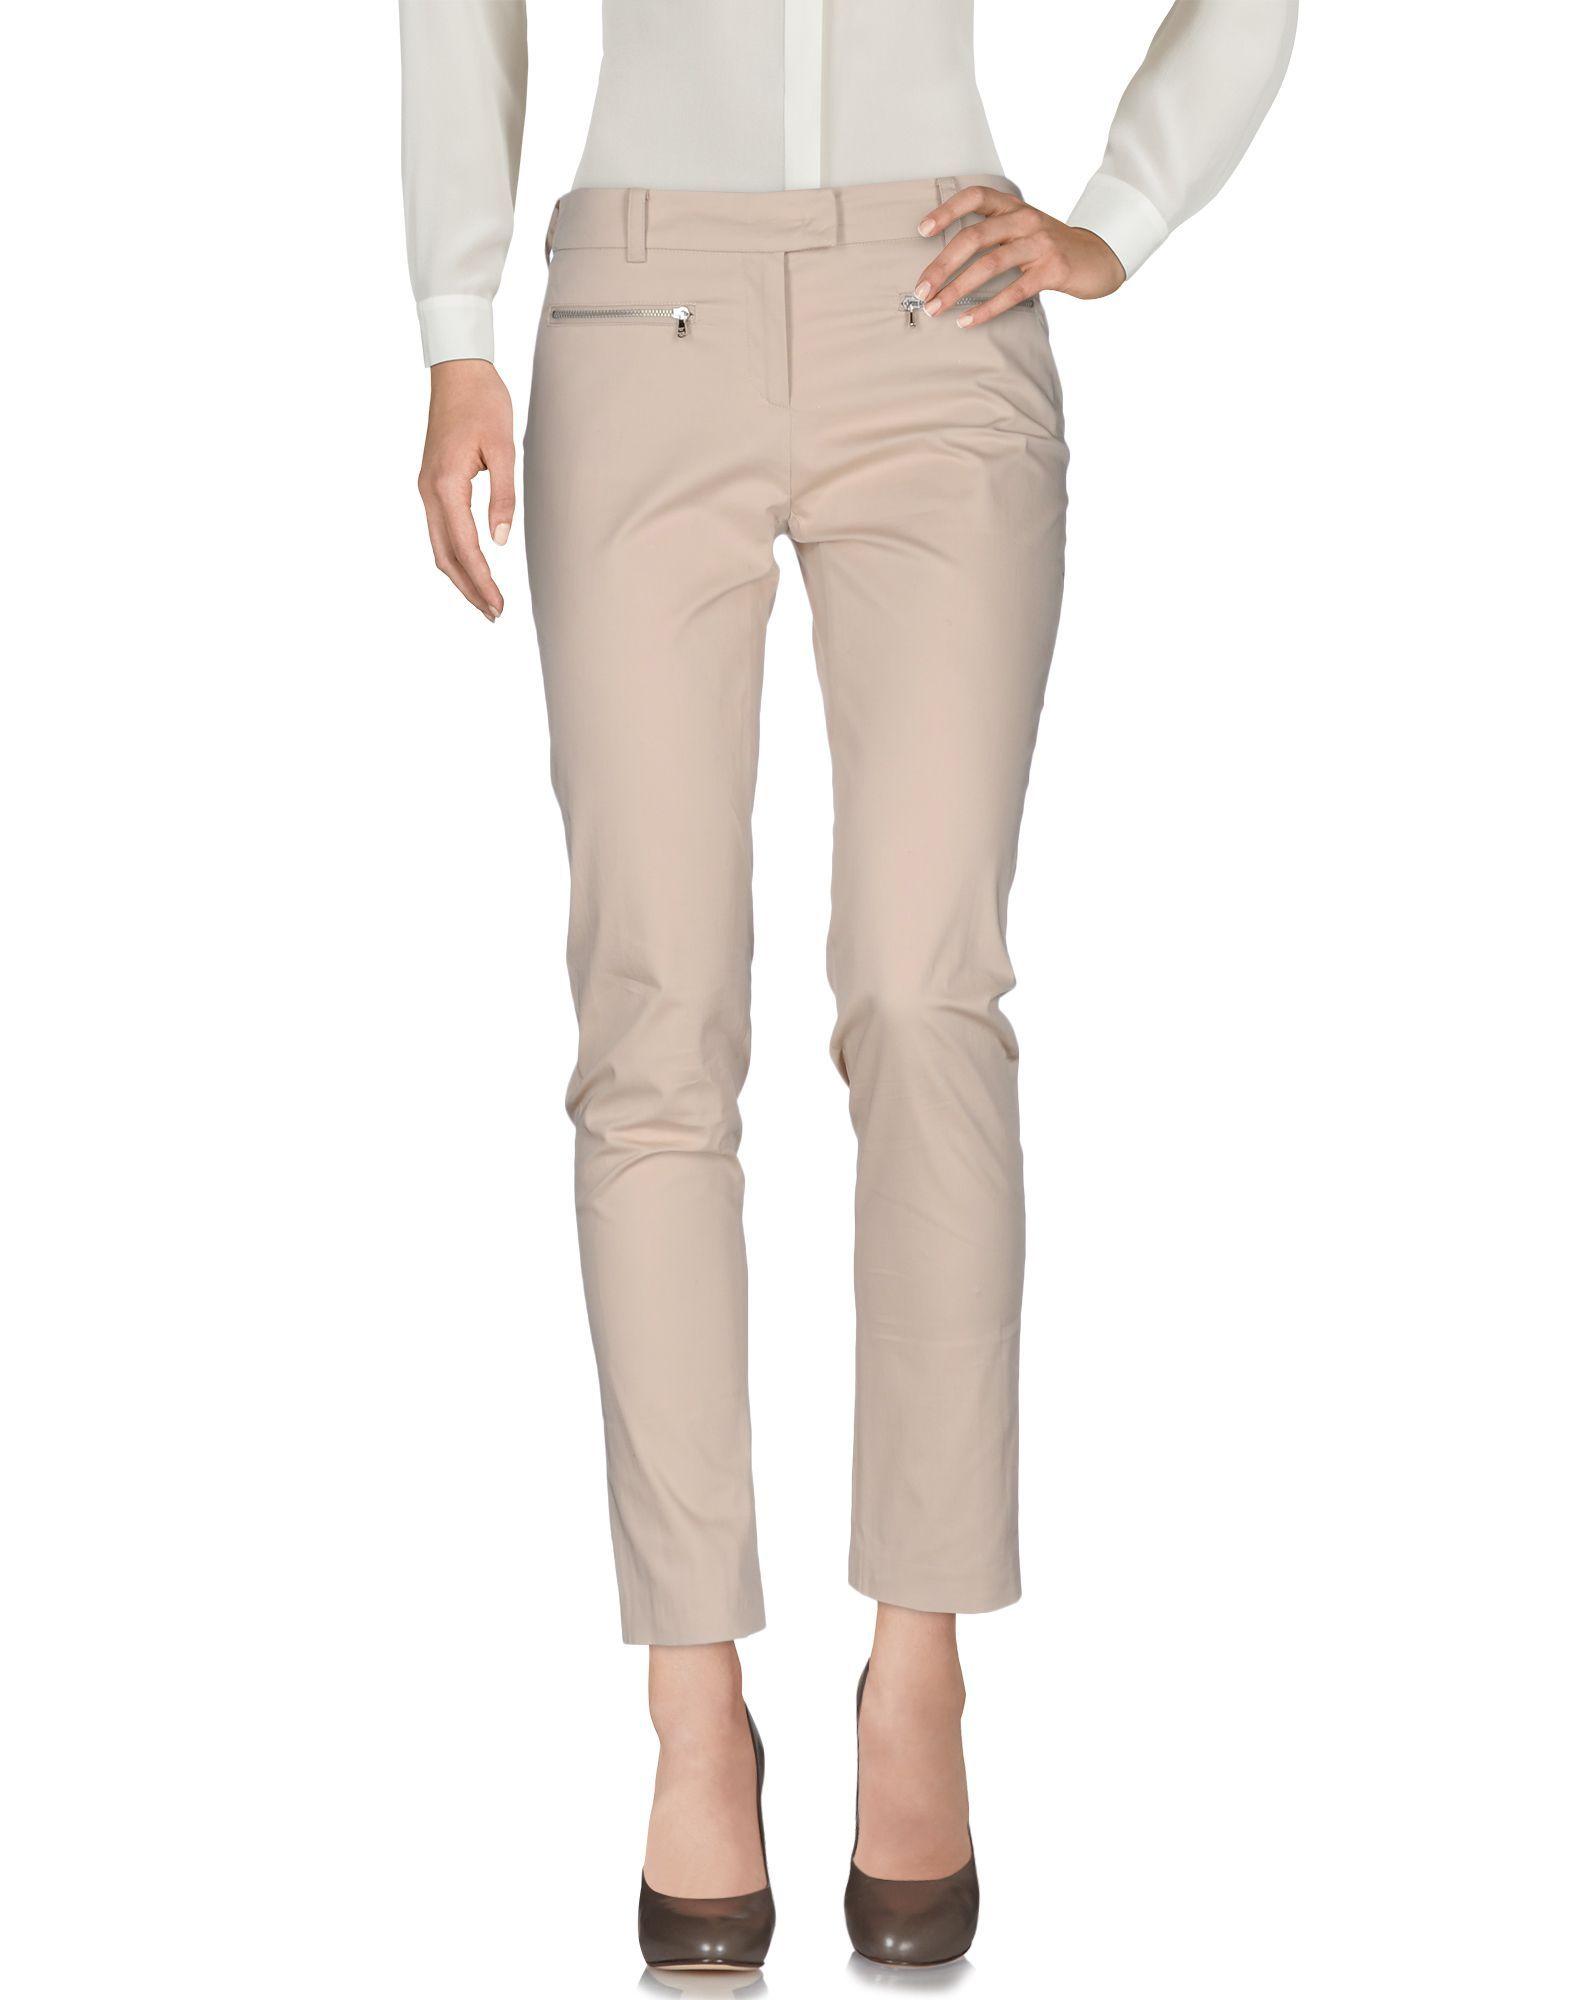 Patrizia Pepe Beige Cotton Trousers